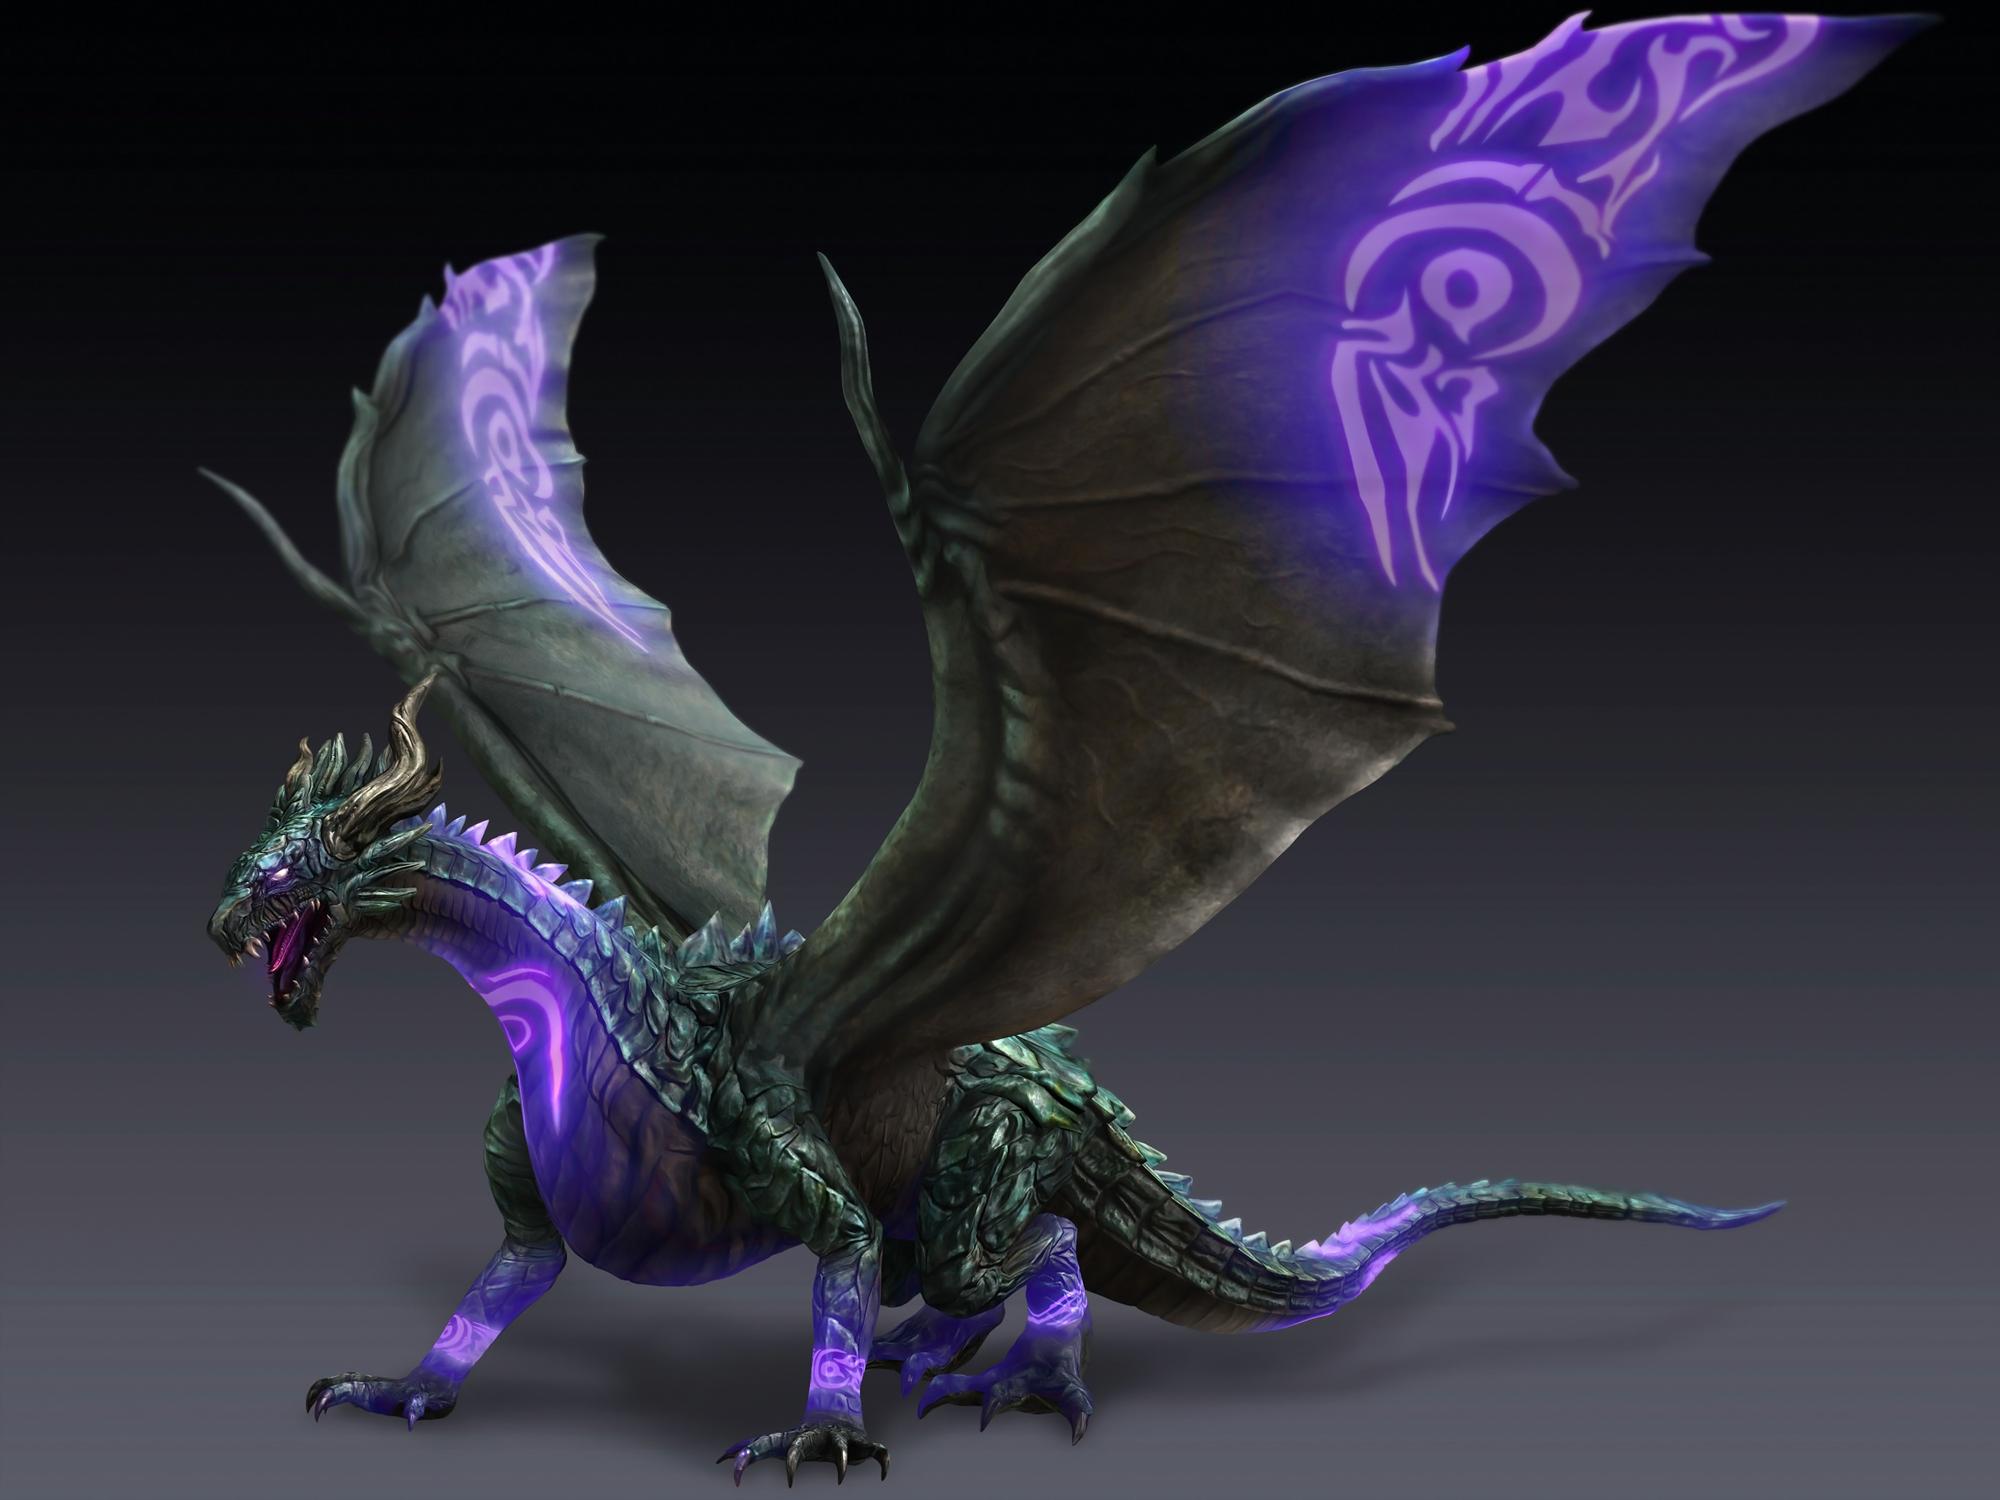 Bladestorm : La Guerre de Cent Ans et Cauchemar Dragon_%28BS%29